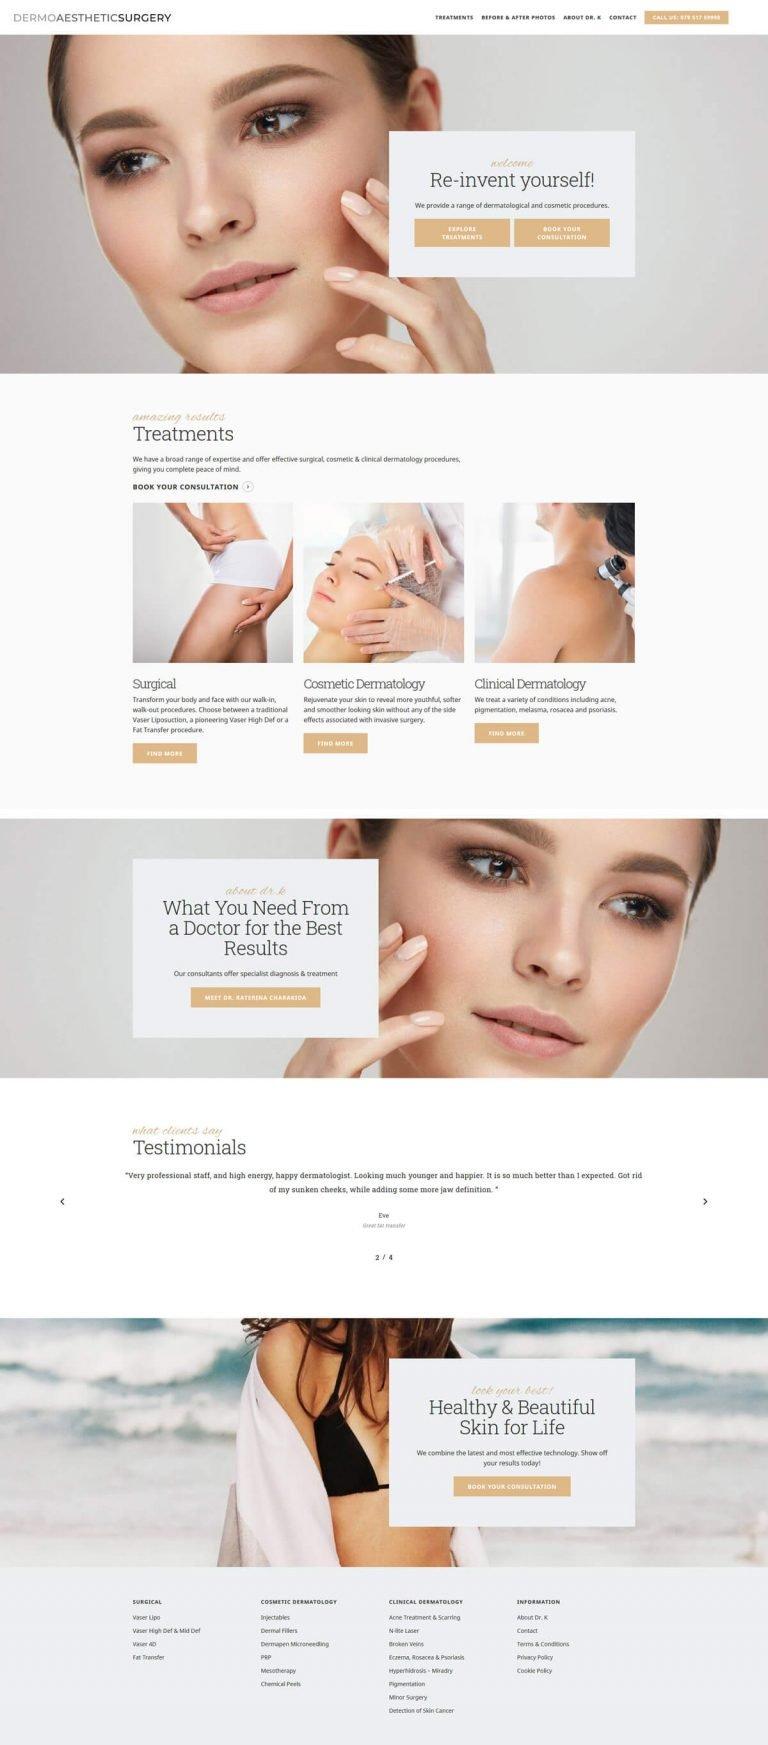 Dermo Aesthetic Surgery / dermoaestheticsurgery.com ...